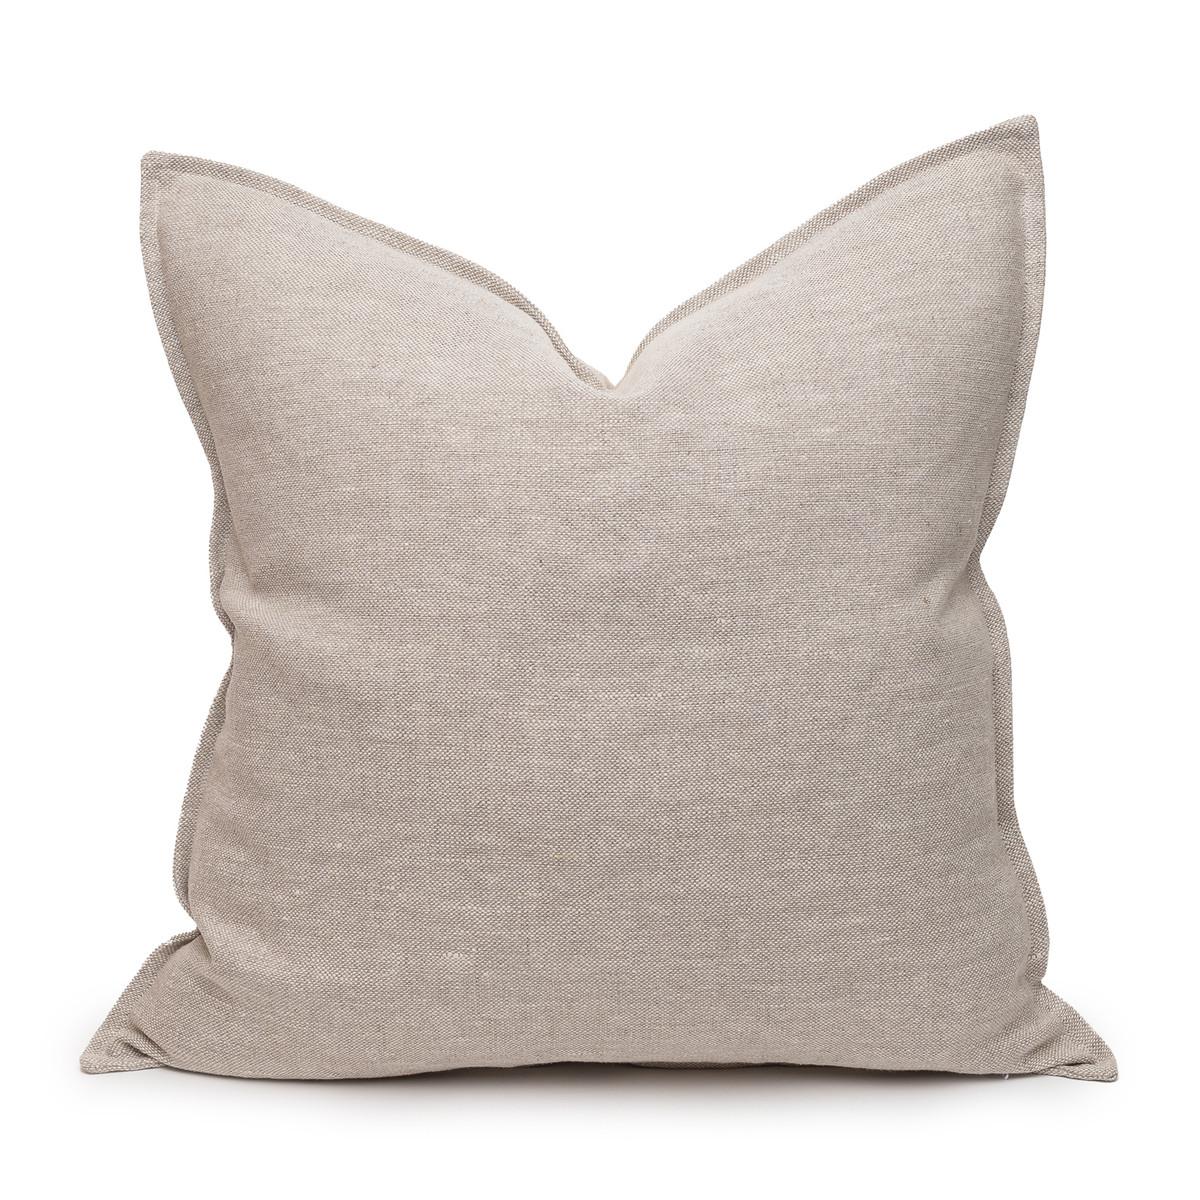 Simone PURE LINEN pillow Natural - front